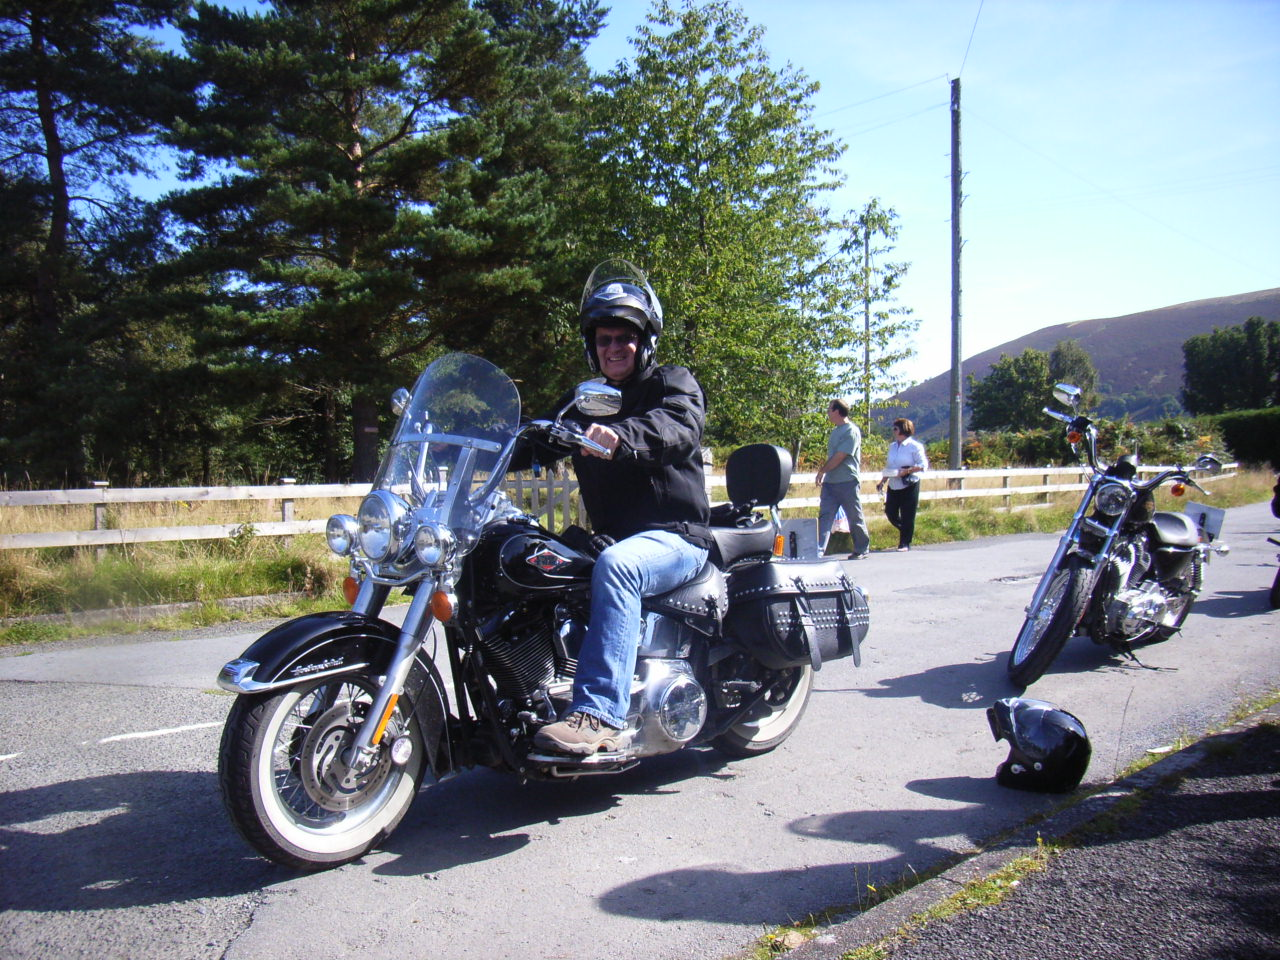 Uneasy Rider perhaps?